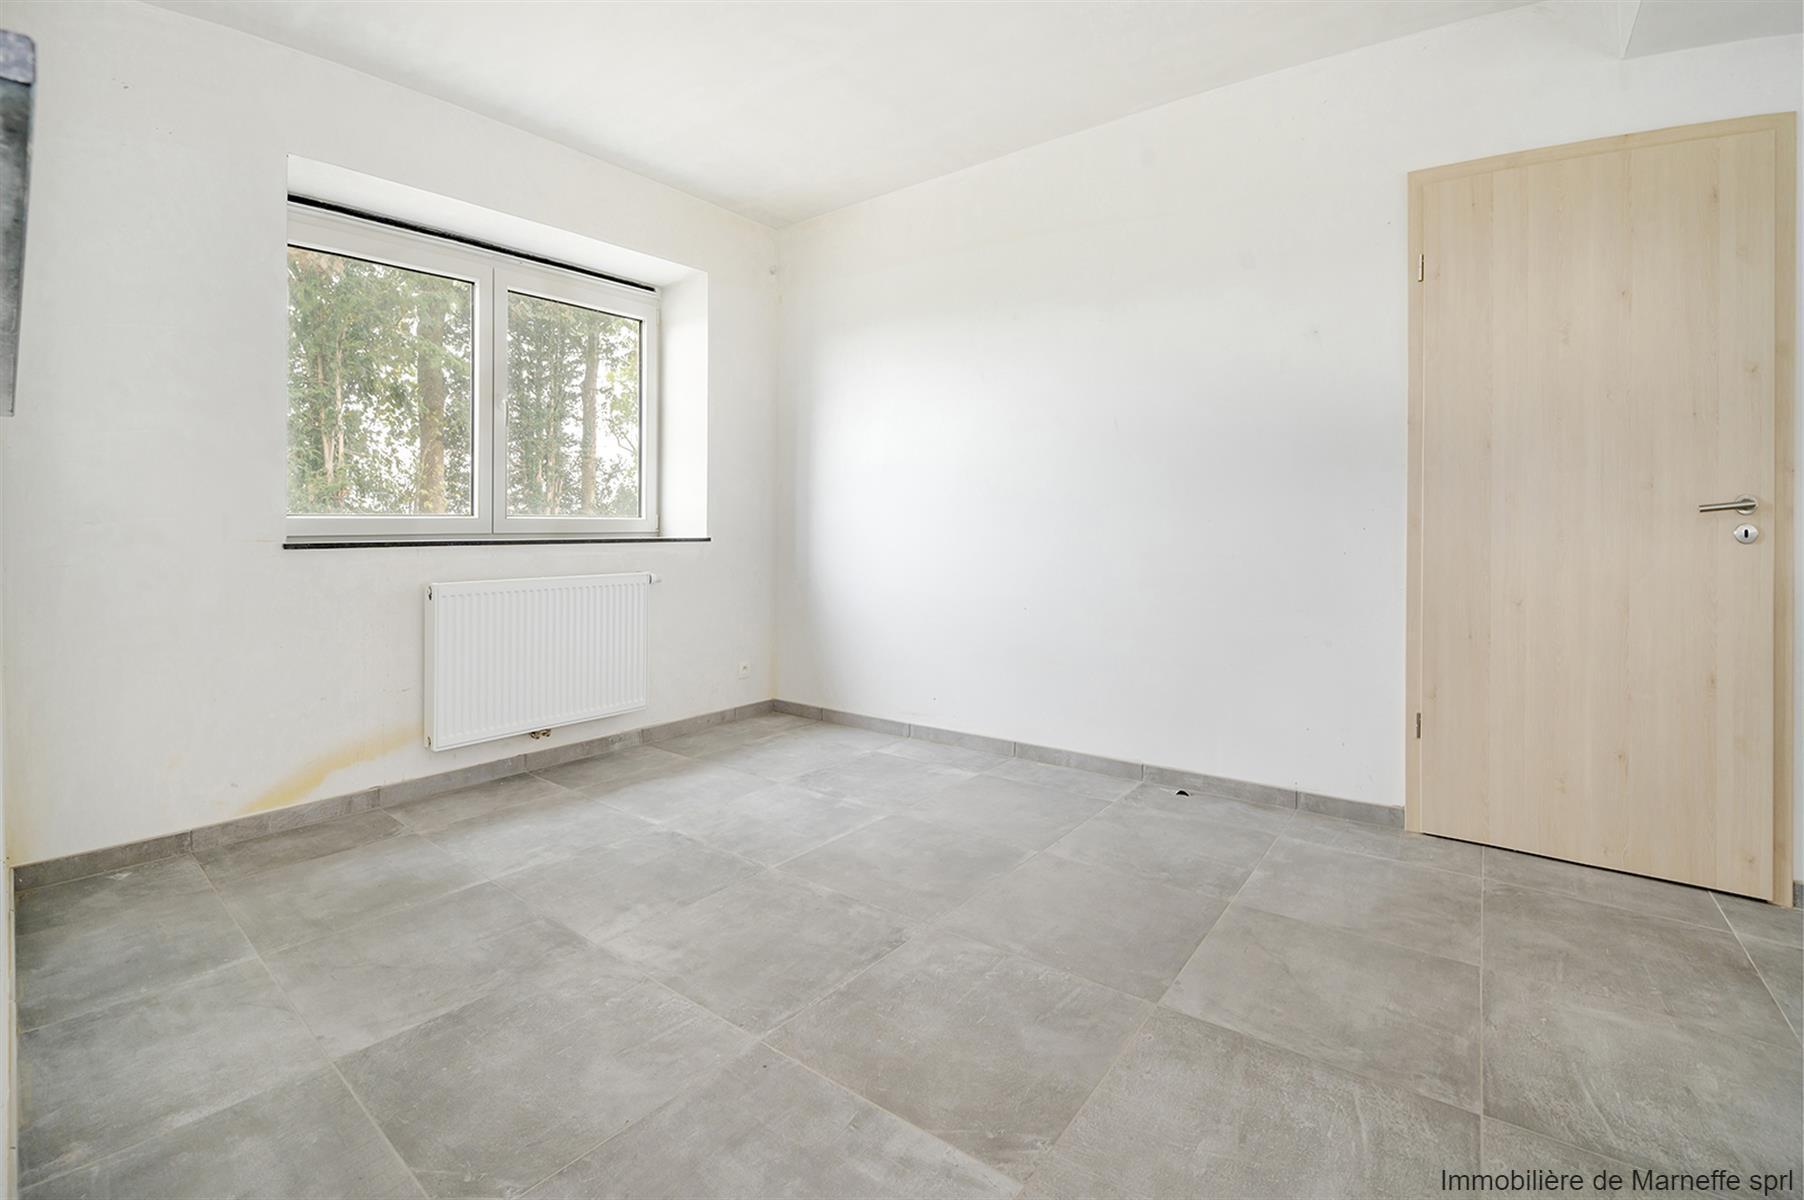 Appartement - Faimes - #4192731-6